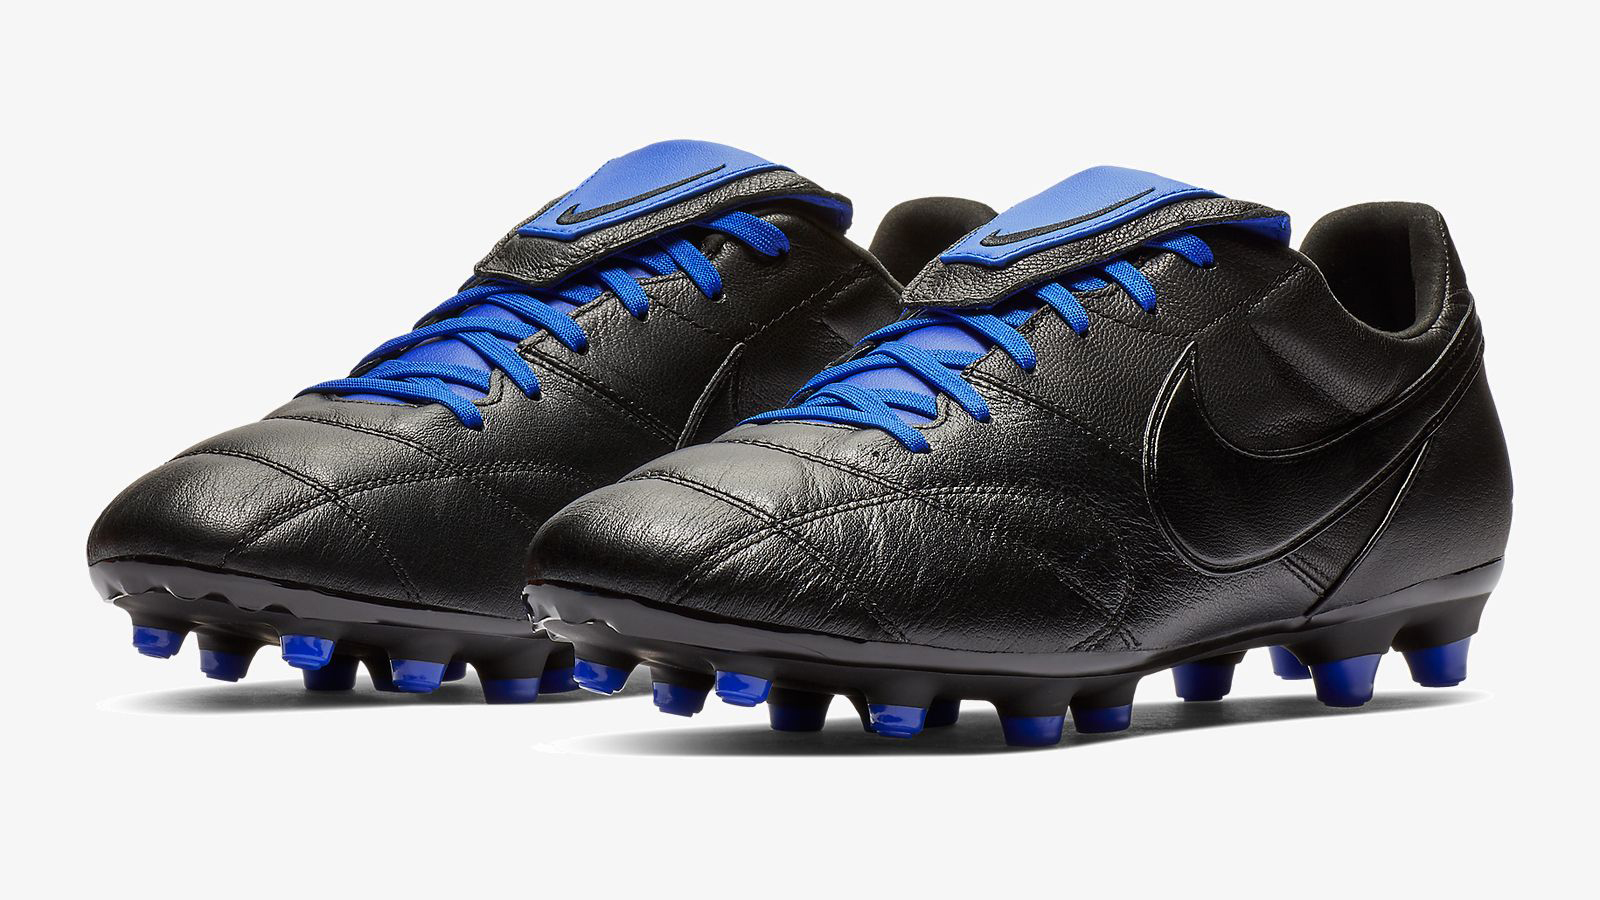 black-racer-blue-nike-premier-ii-boots-5